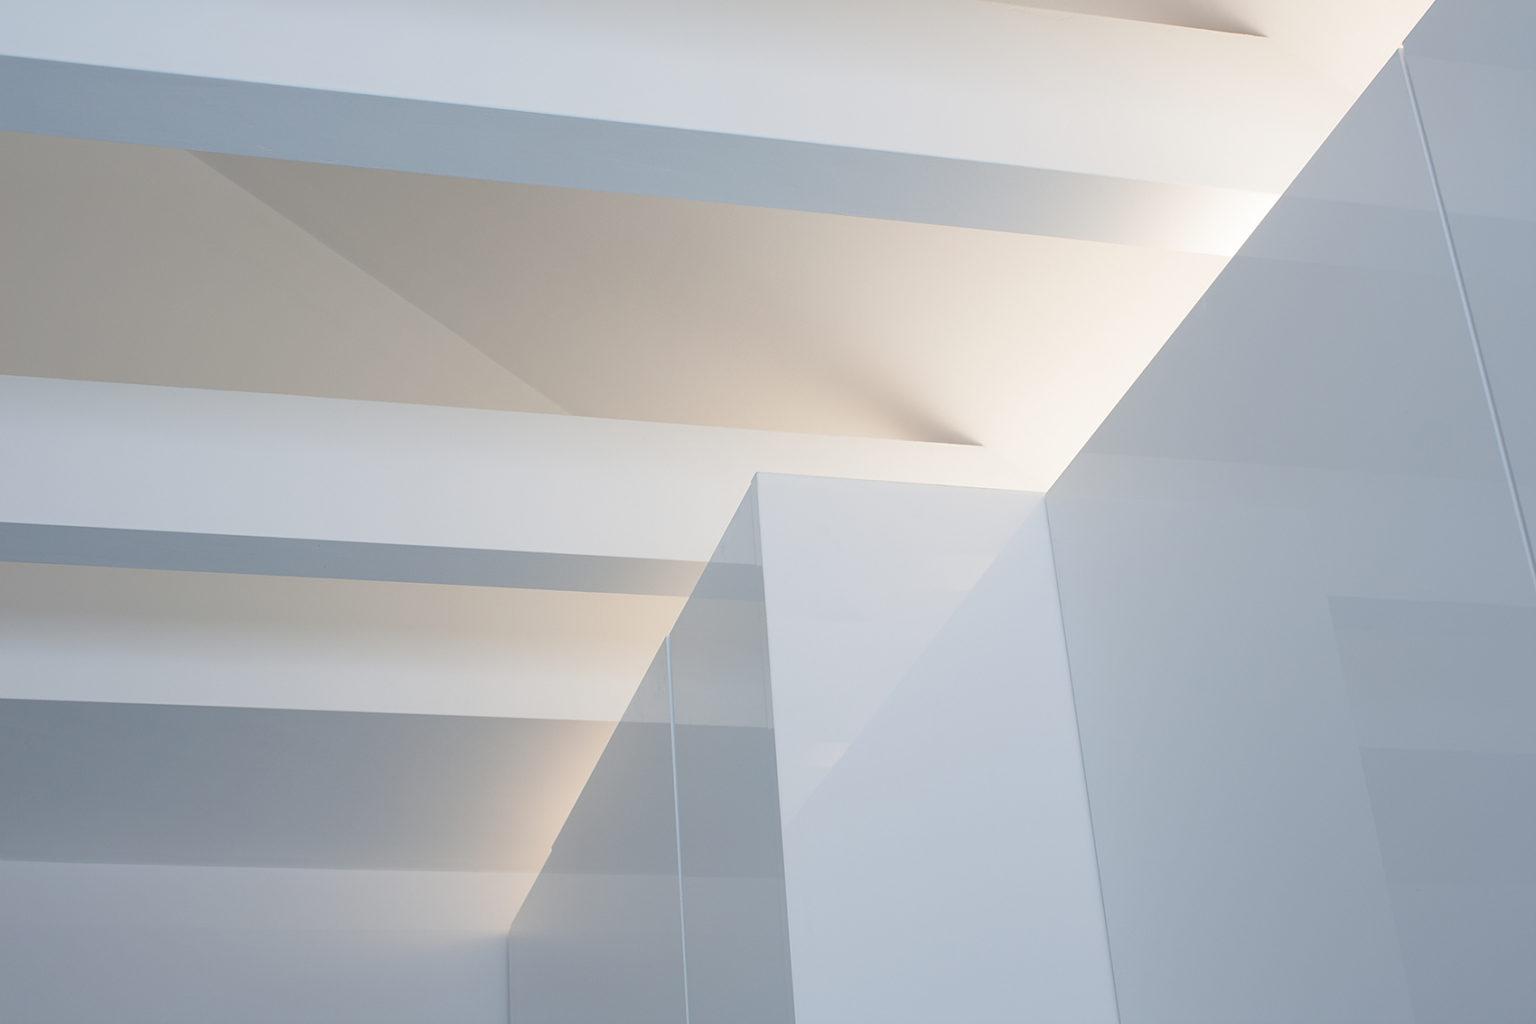 Architectural Design Wiley Online Library Architecture Design